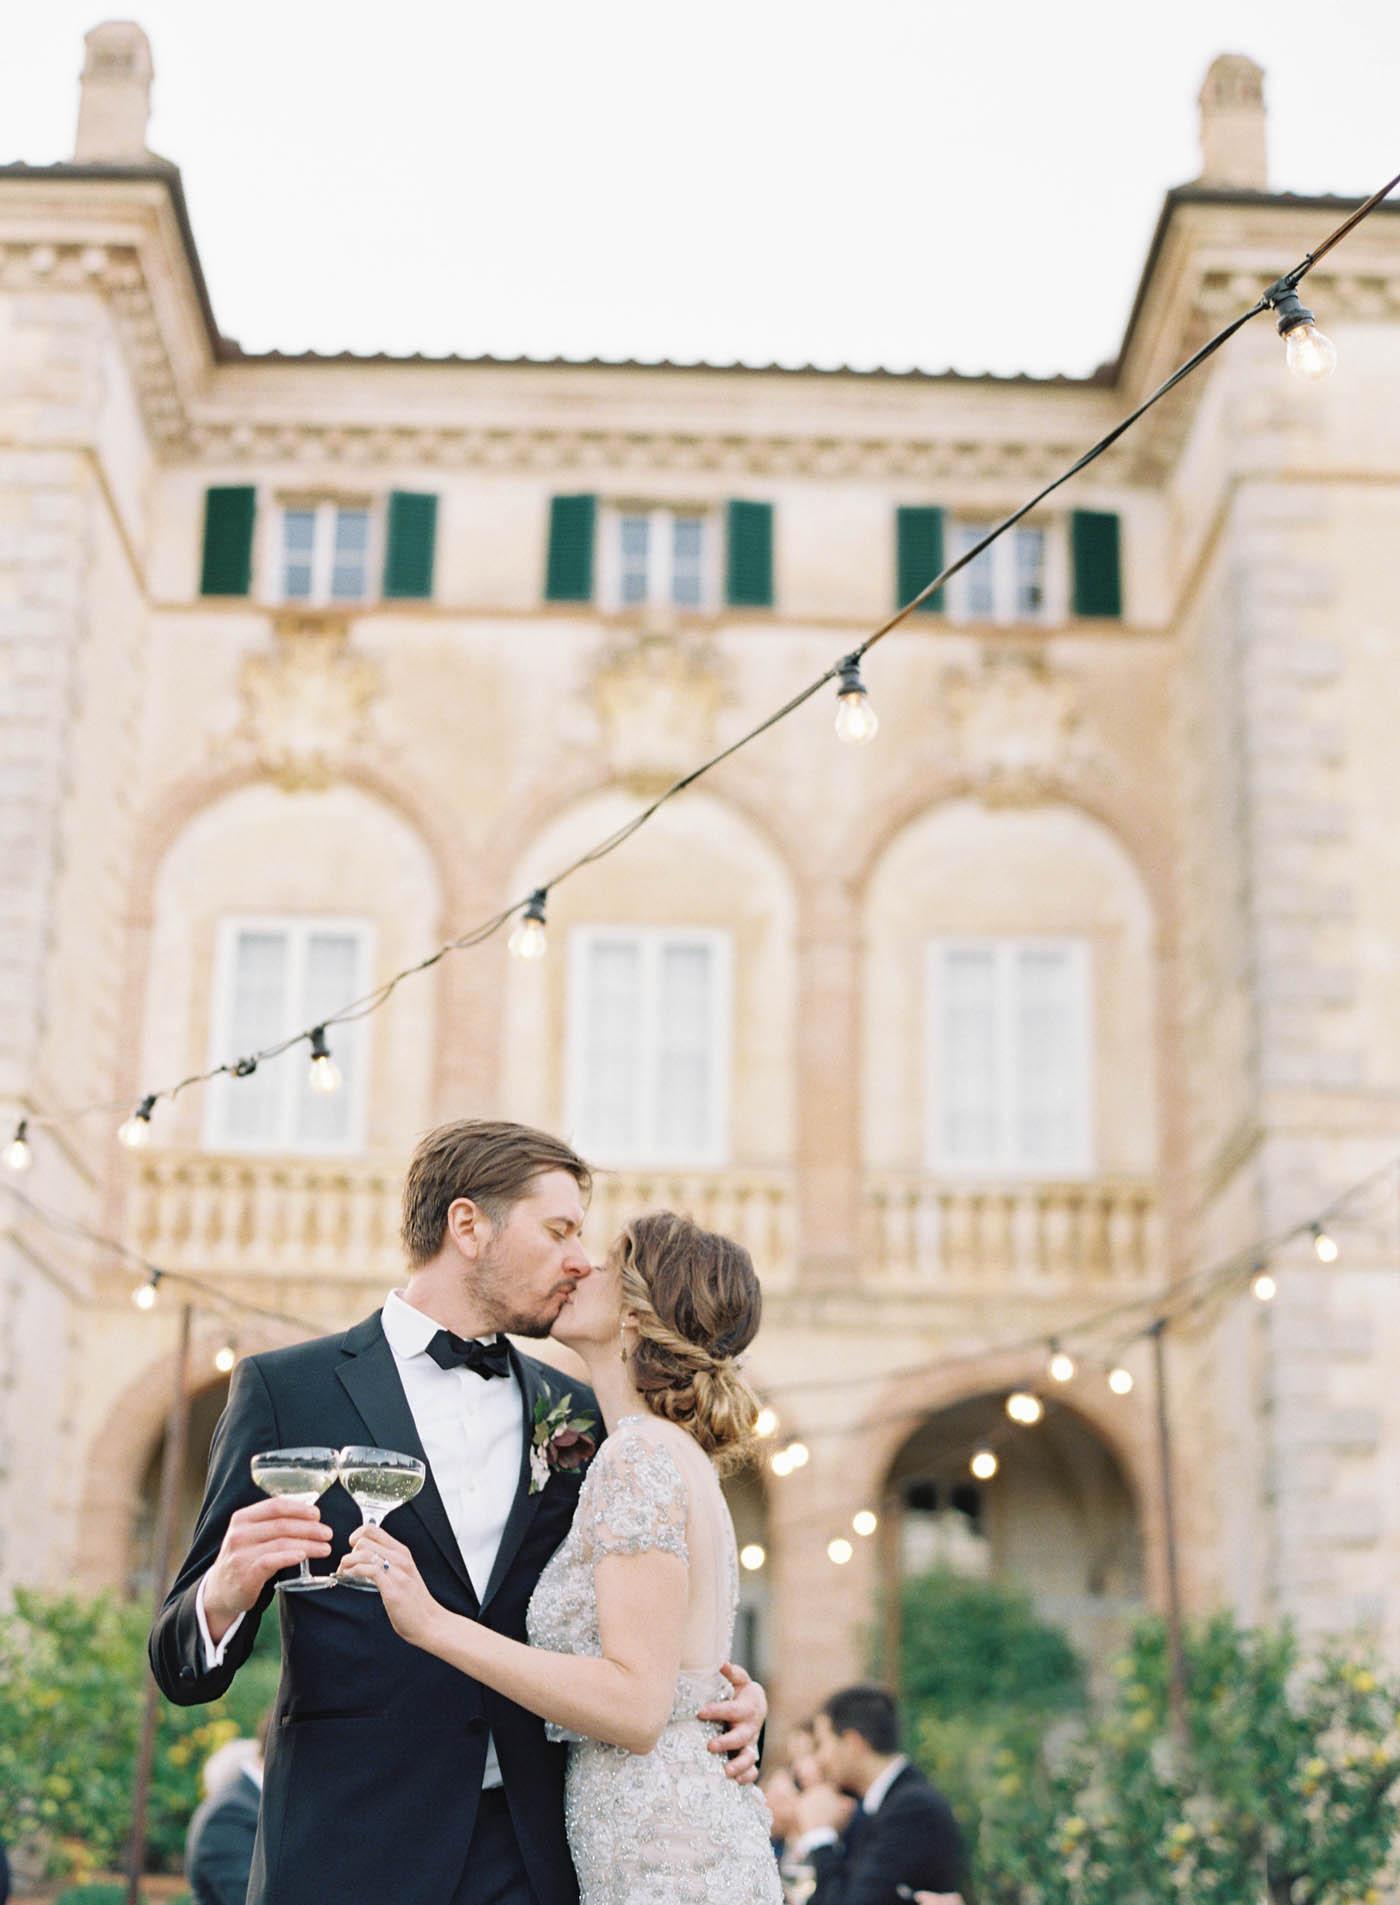 Villa_Cetinale_Wedding-57-Jen_Huang-ElanJacob-326-Jen_Huang-007326-R1-009.jpg